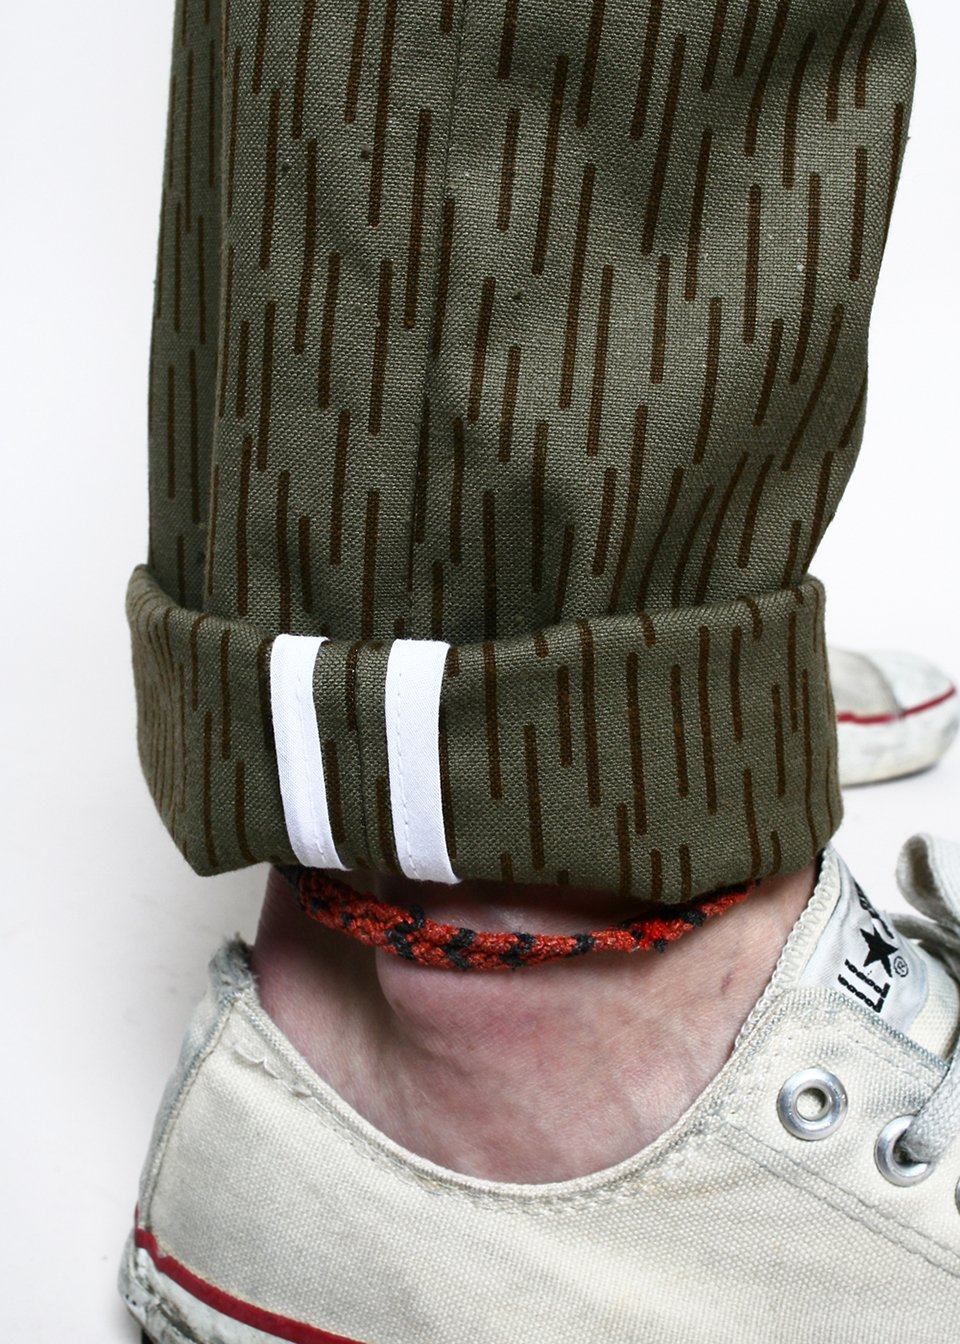 east german raindrop camo pants